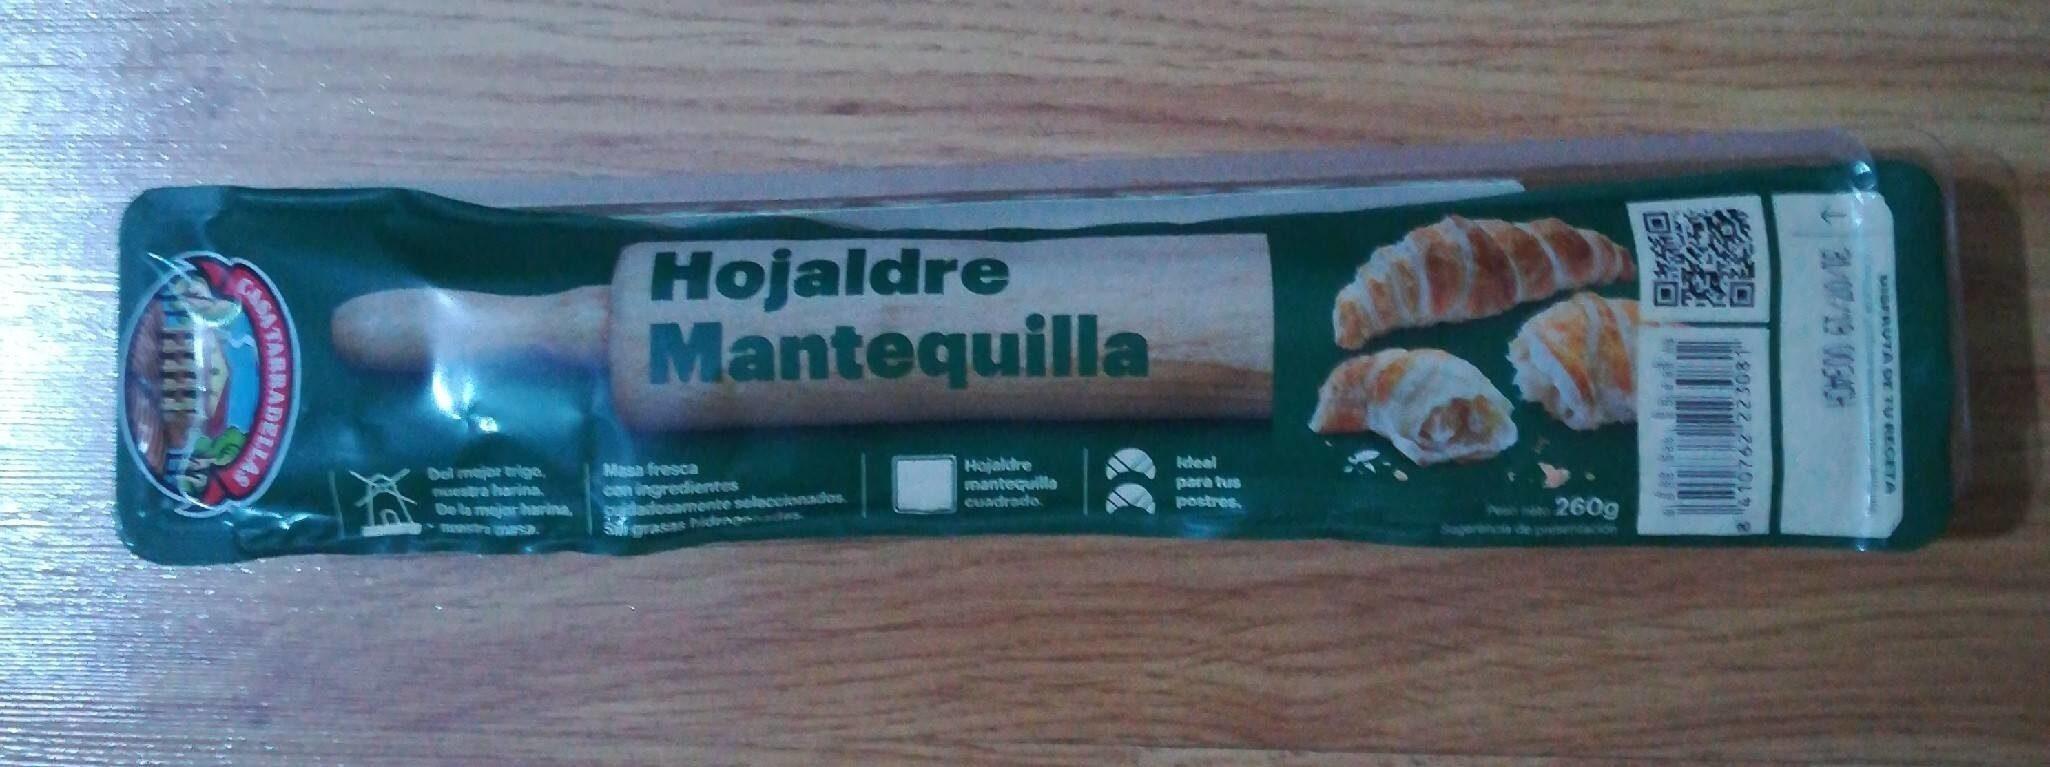 Masa hojaldre mantequilla - Producte